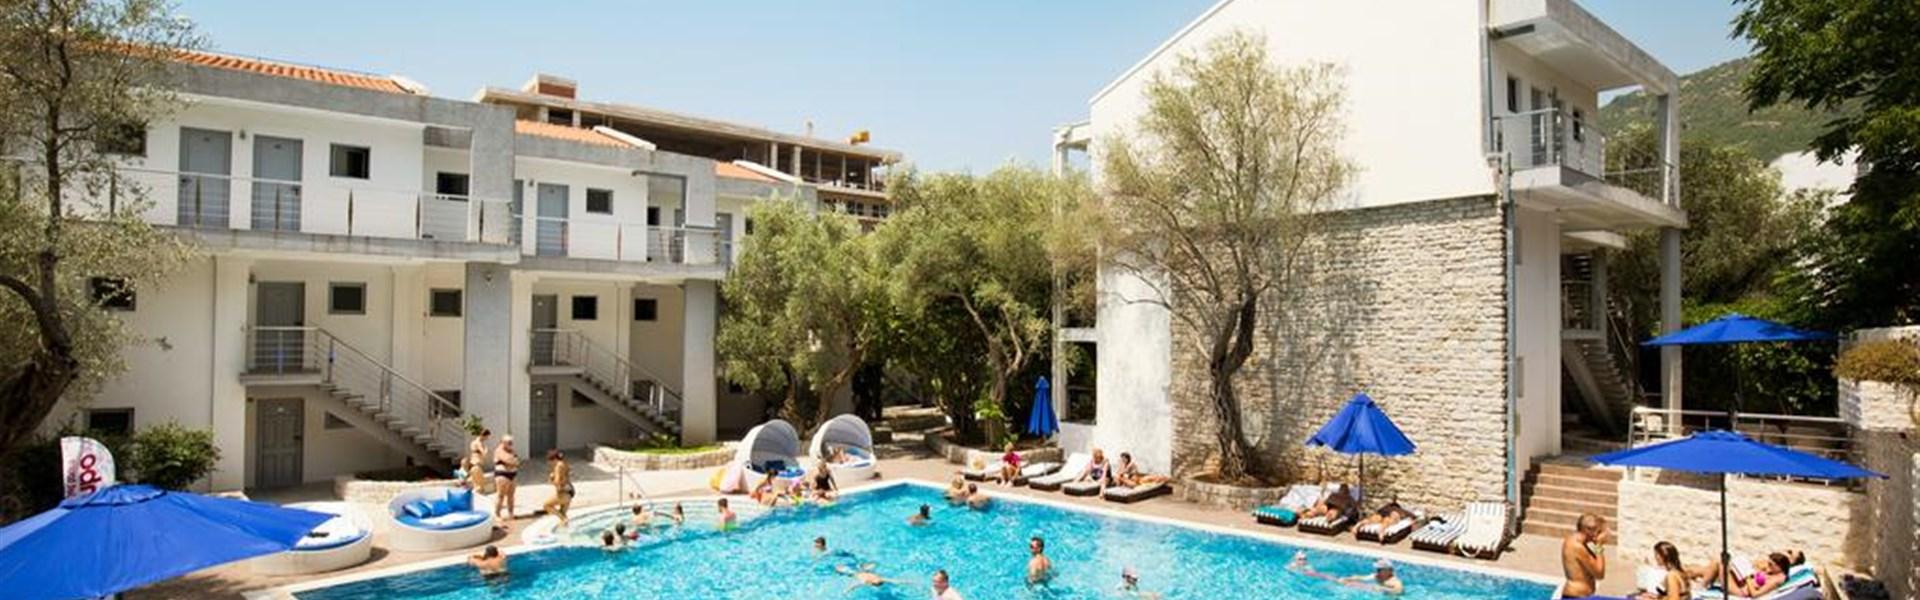 Marco Polo - Hotel Vile Oliva -